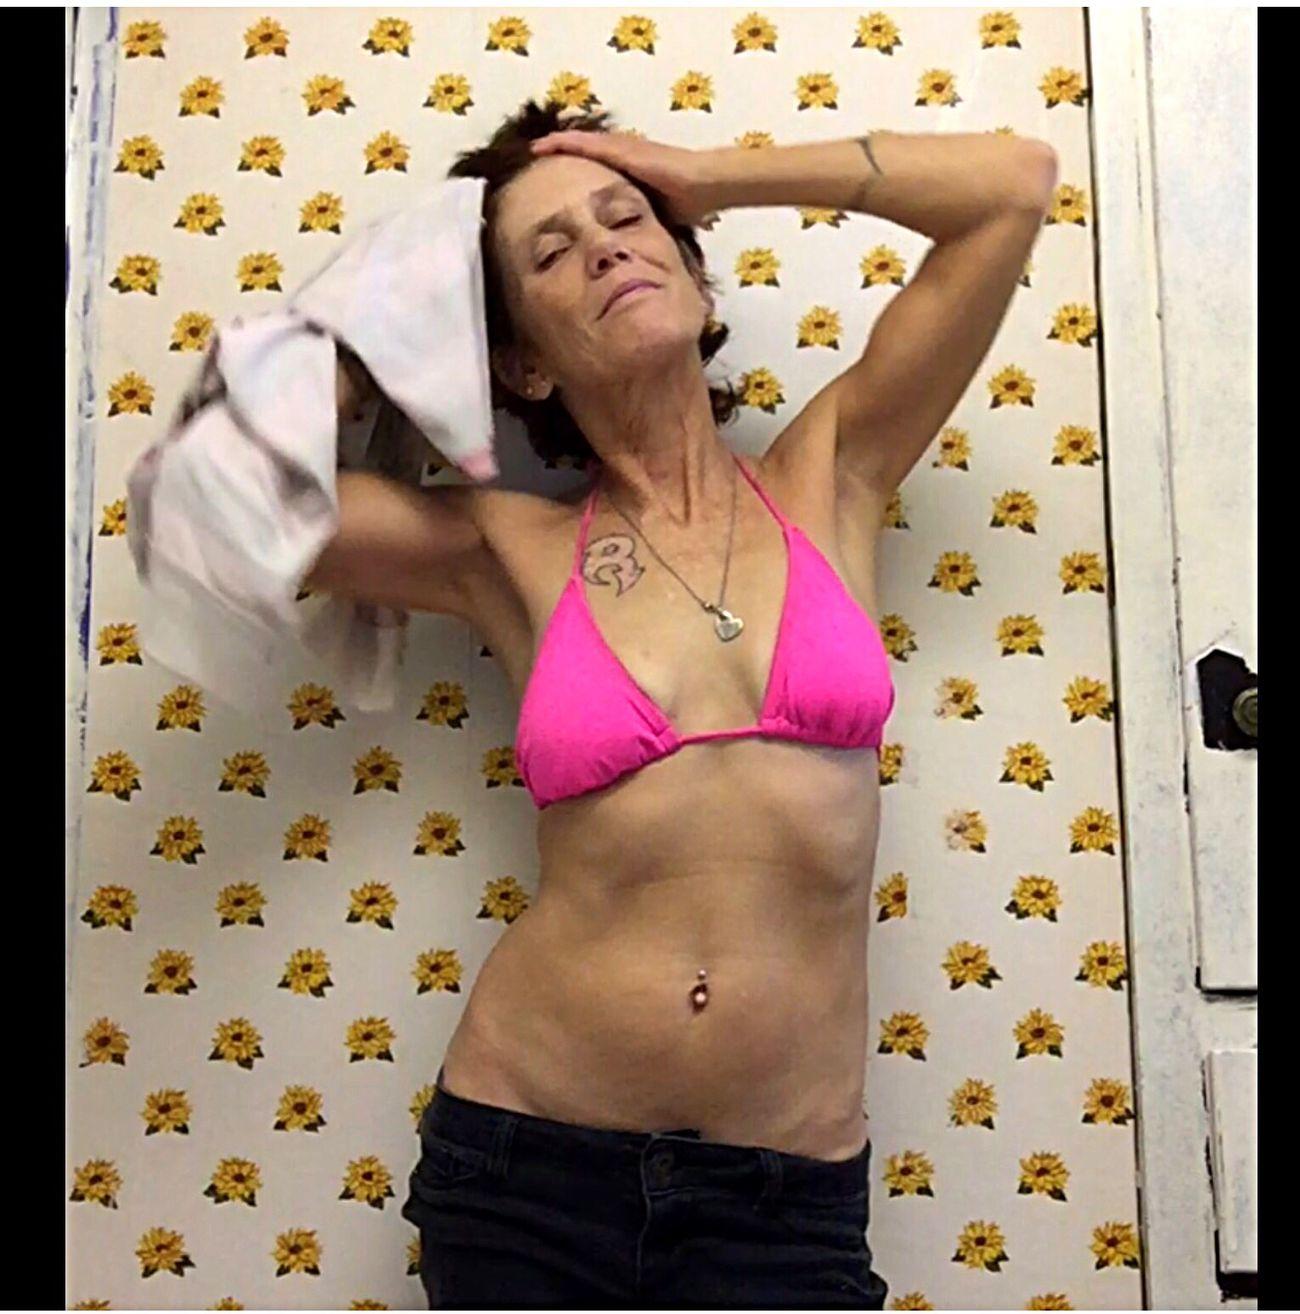 Feeling Good Feeling Myself  SexyAsFuck Atwork Is What I Do! Showoff  Show It Off,just Alil Bit ;) Bikinimodel SexyGirl.♥ Sexywomen Hottie Hot Body Texasheat DeepintheheartofTexas Bikinifetish DevineTx Bellybuttonfetish Yourview Bikimilovers Bikiniporn Pink Color Think Pink Pink Bikini Lots Of Fun Bikinibody